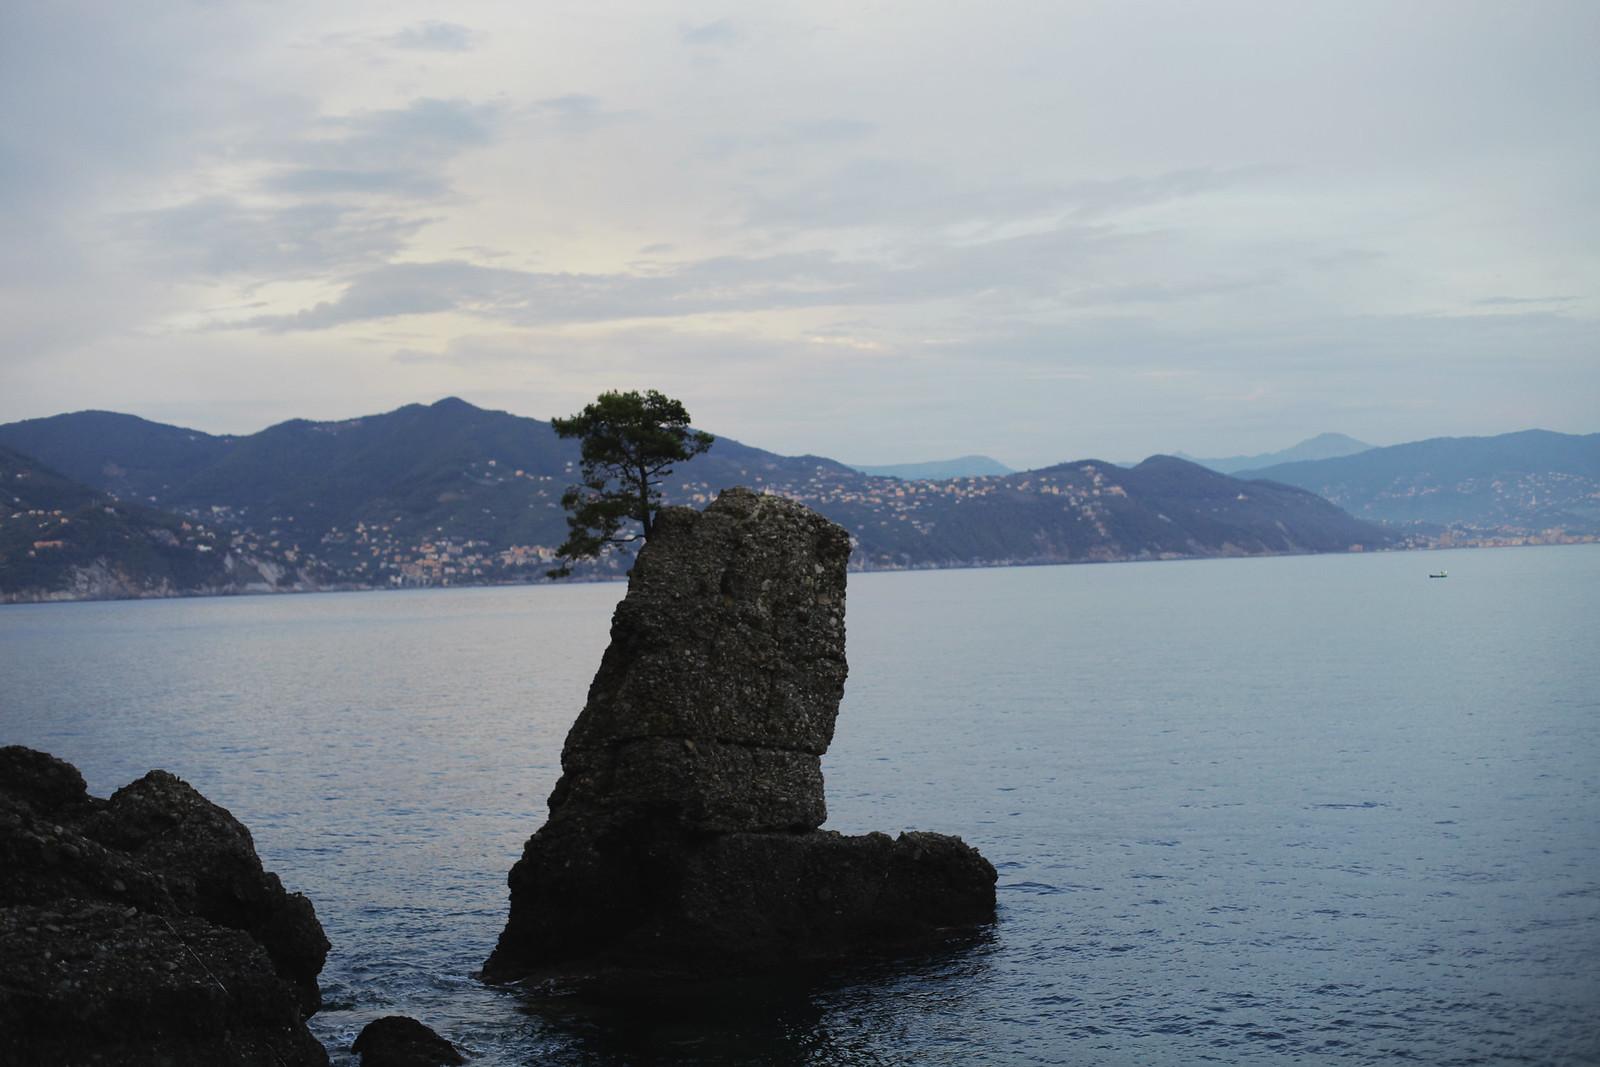 Walking from Portofino to Santa Margherita